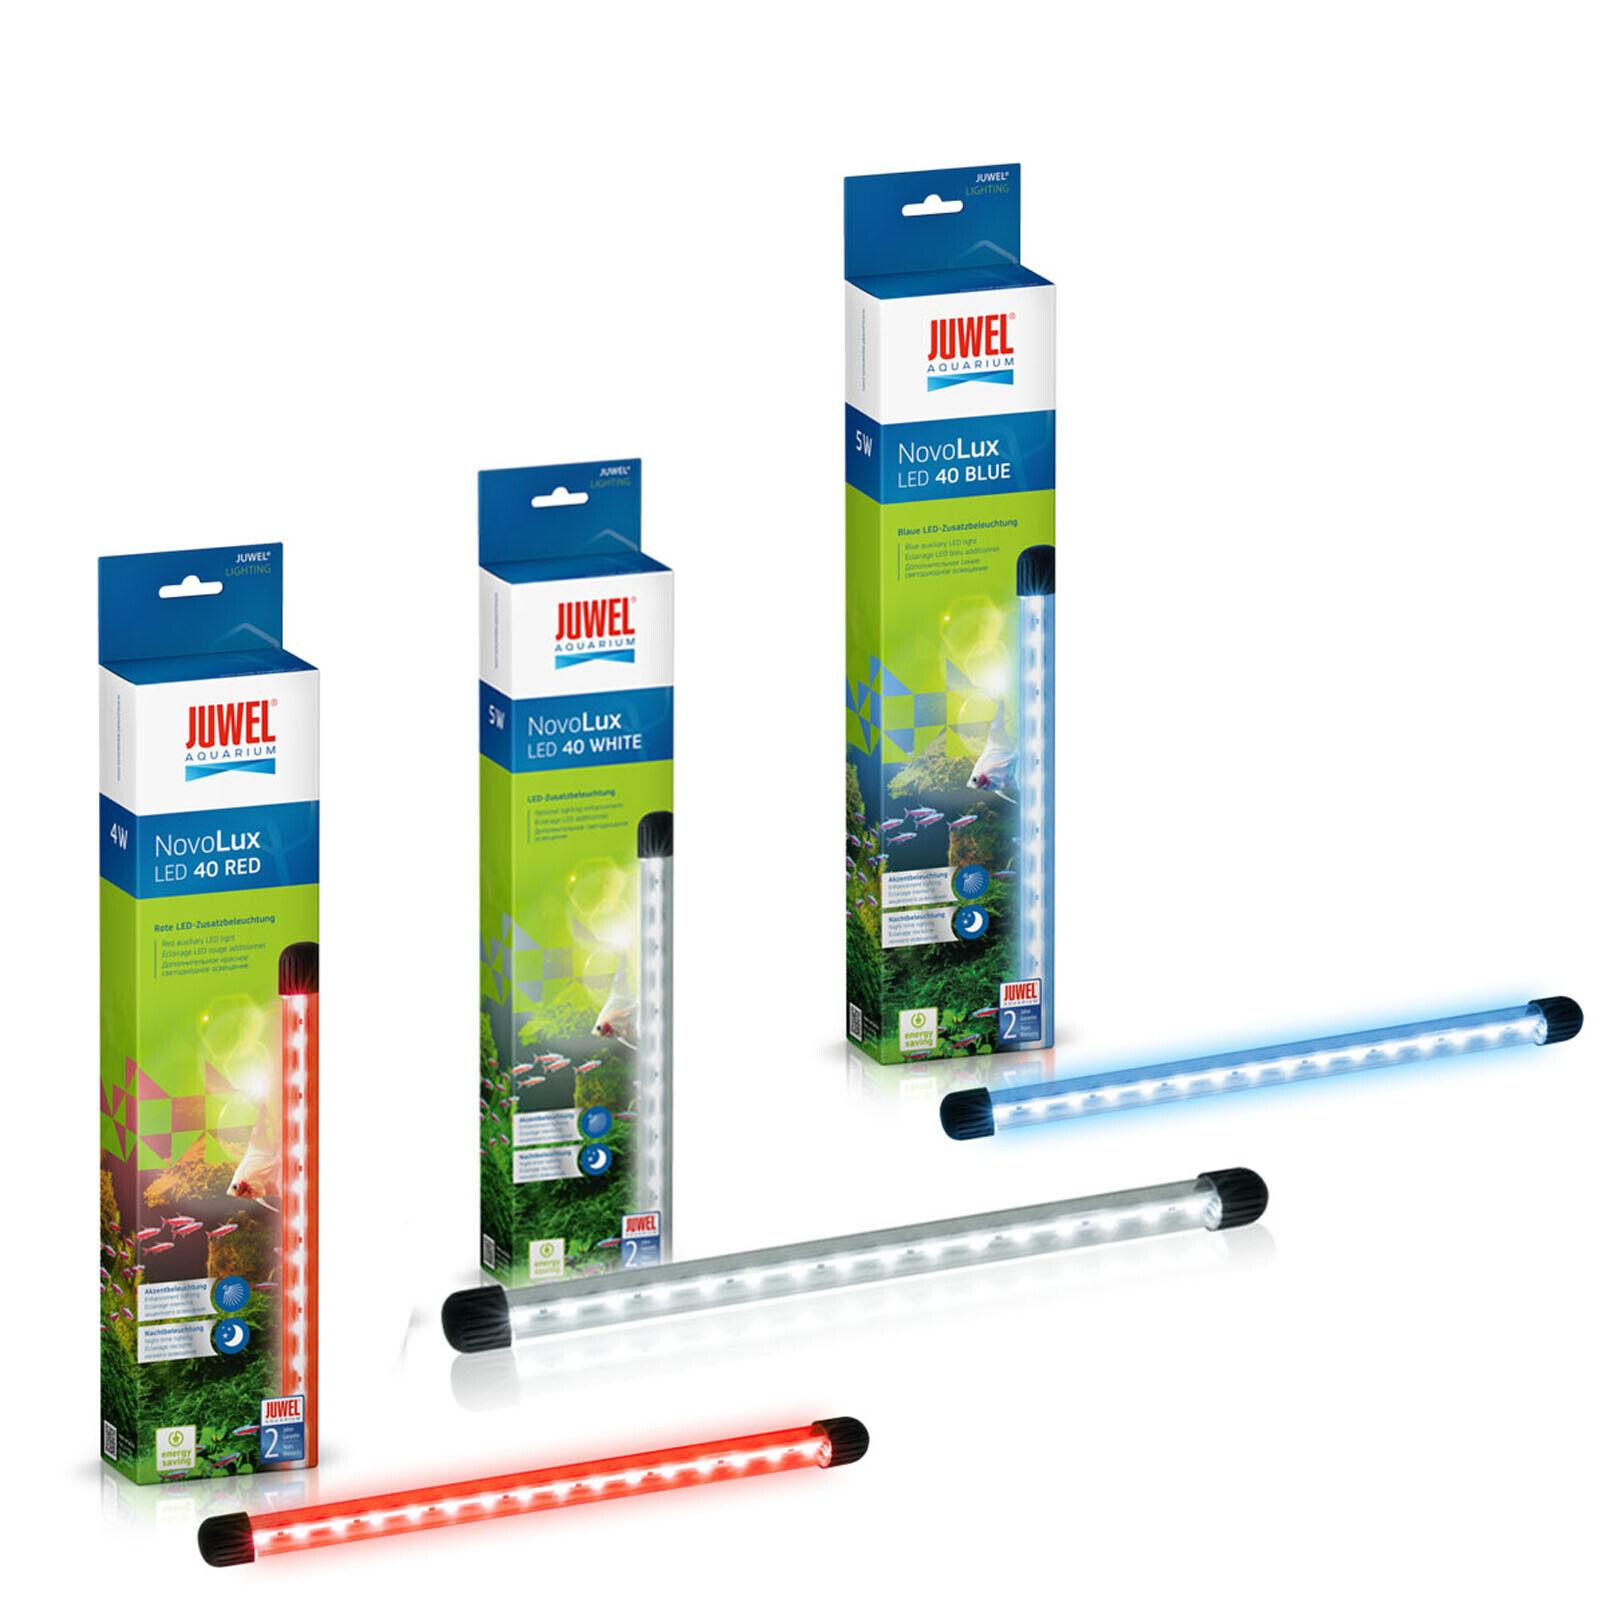 Genuine Juwel NovoLux LED 40 White   bluee   Red Waterproof Energy-saving Light